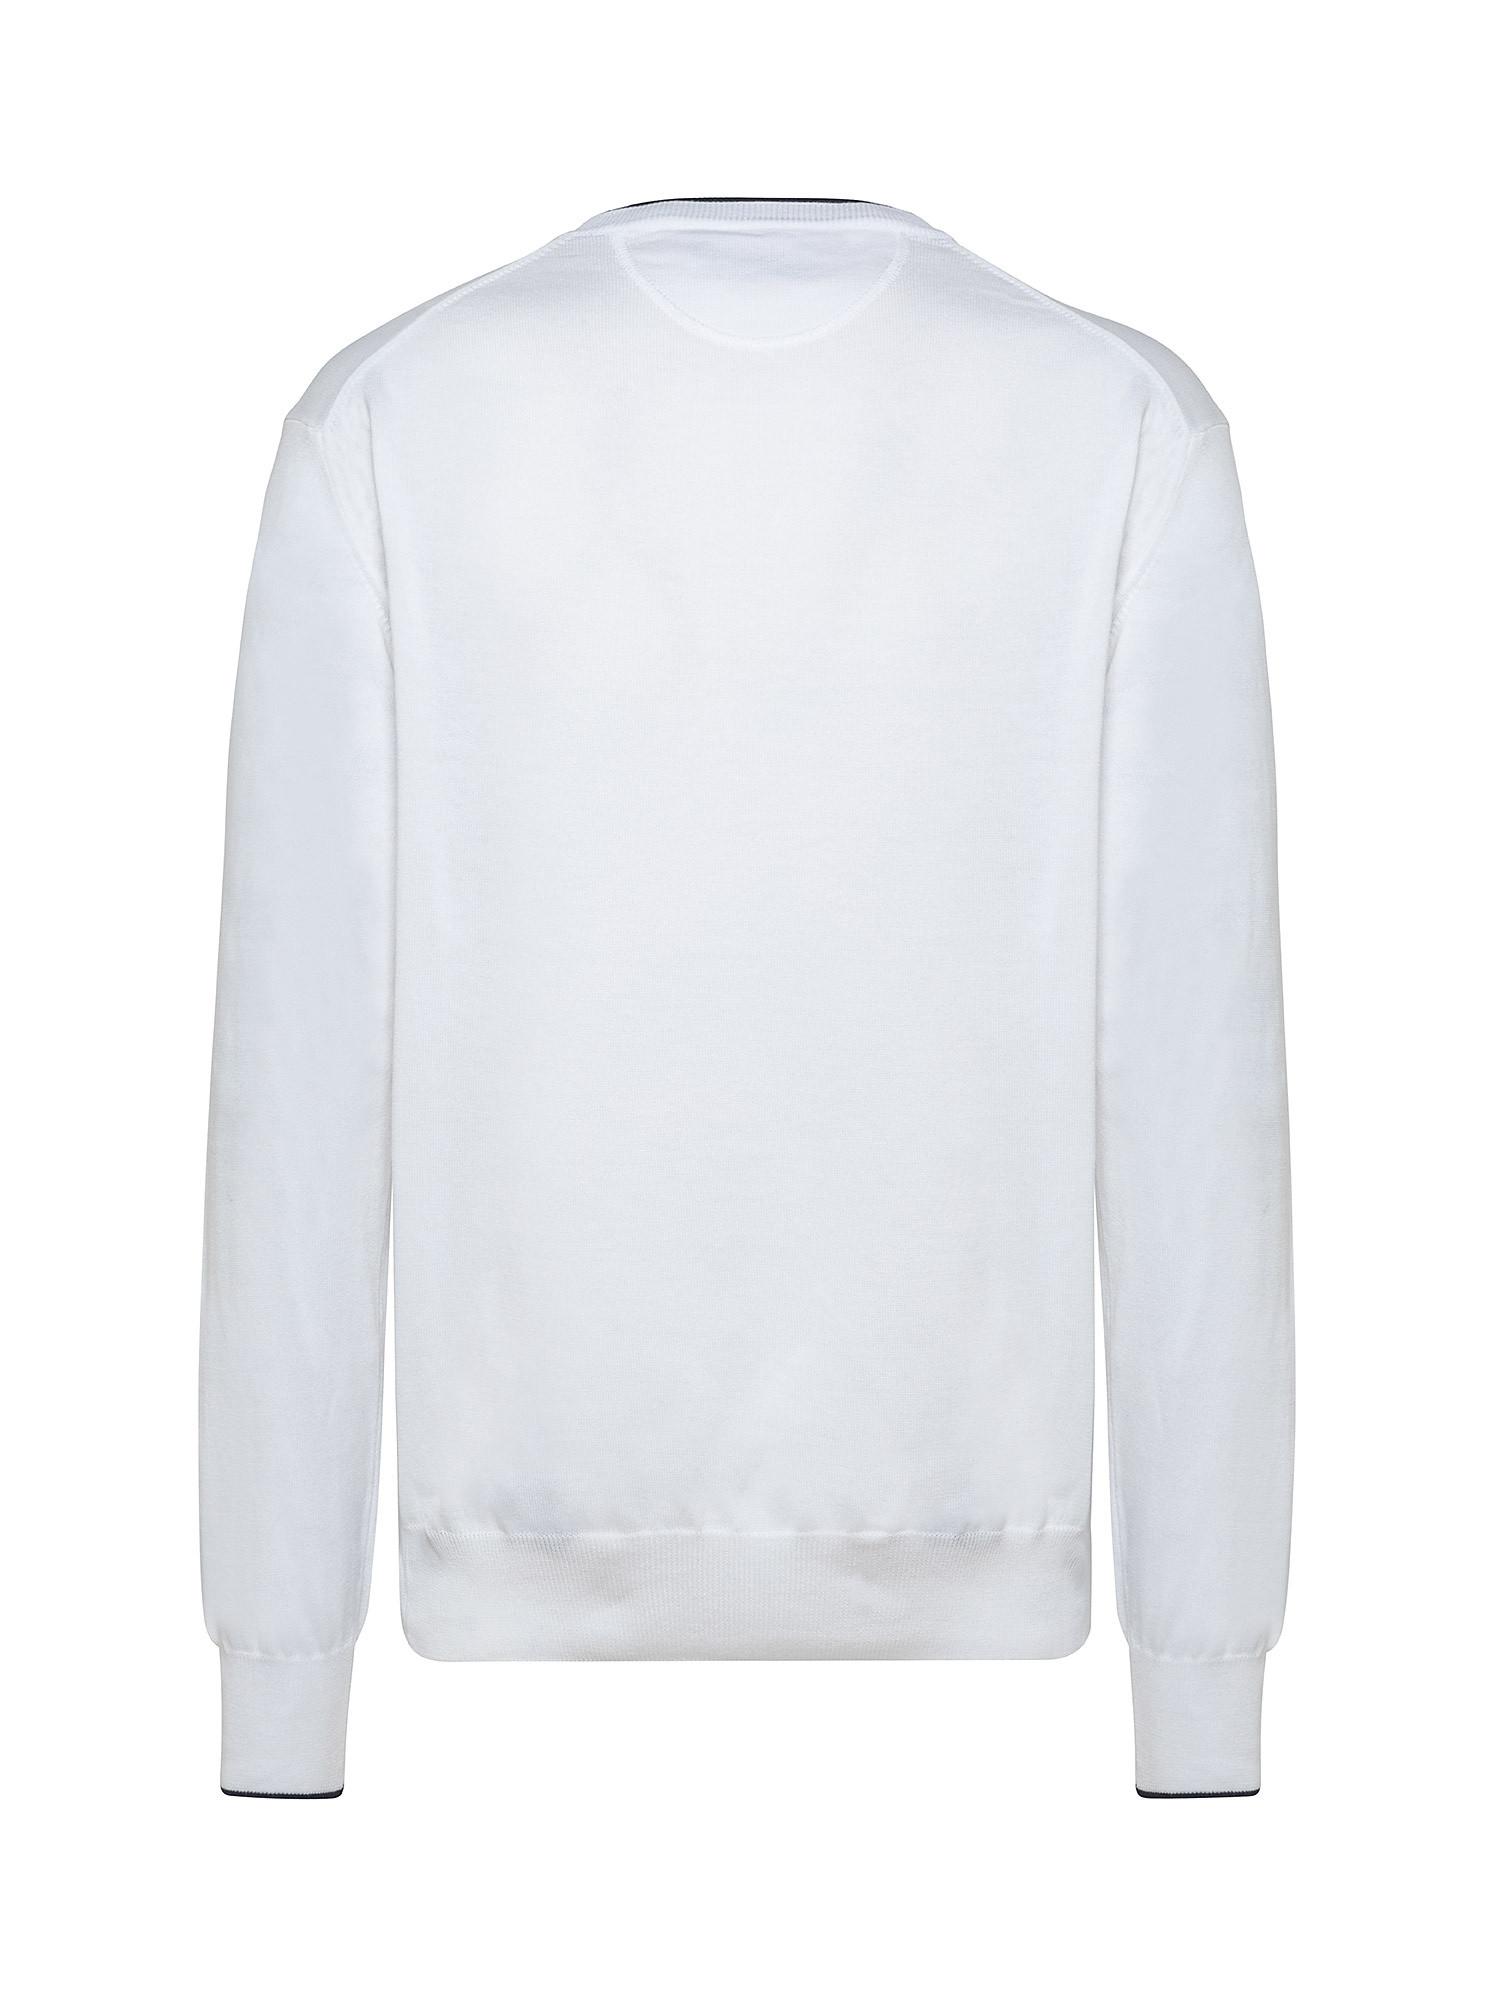 Felpa da uomo in cotone regular fit, Bianco, large image number 1